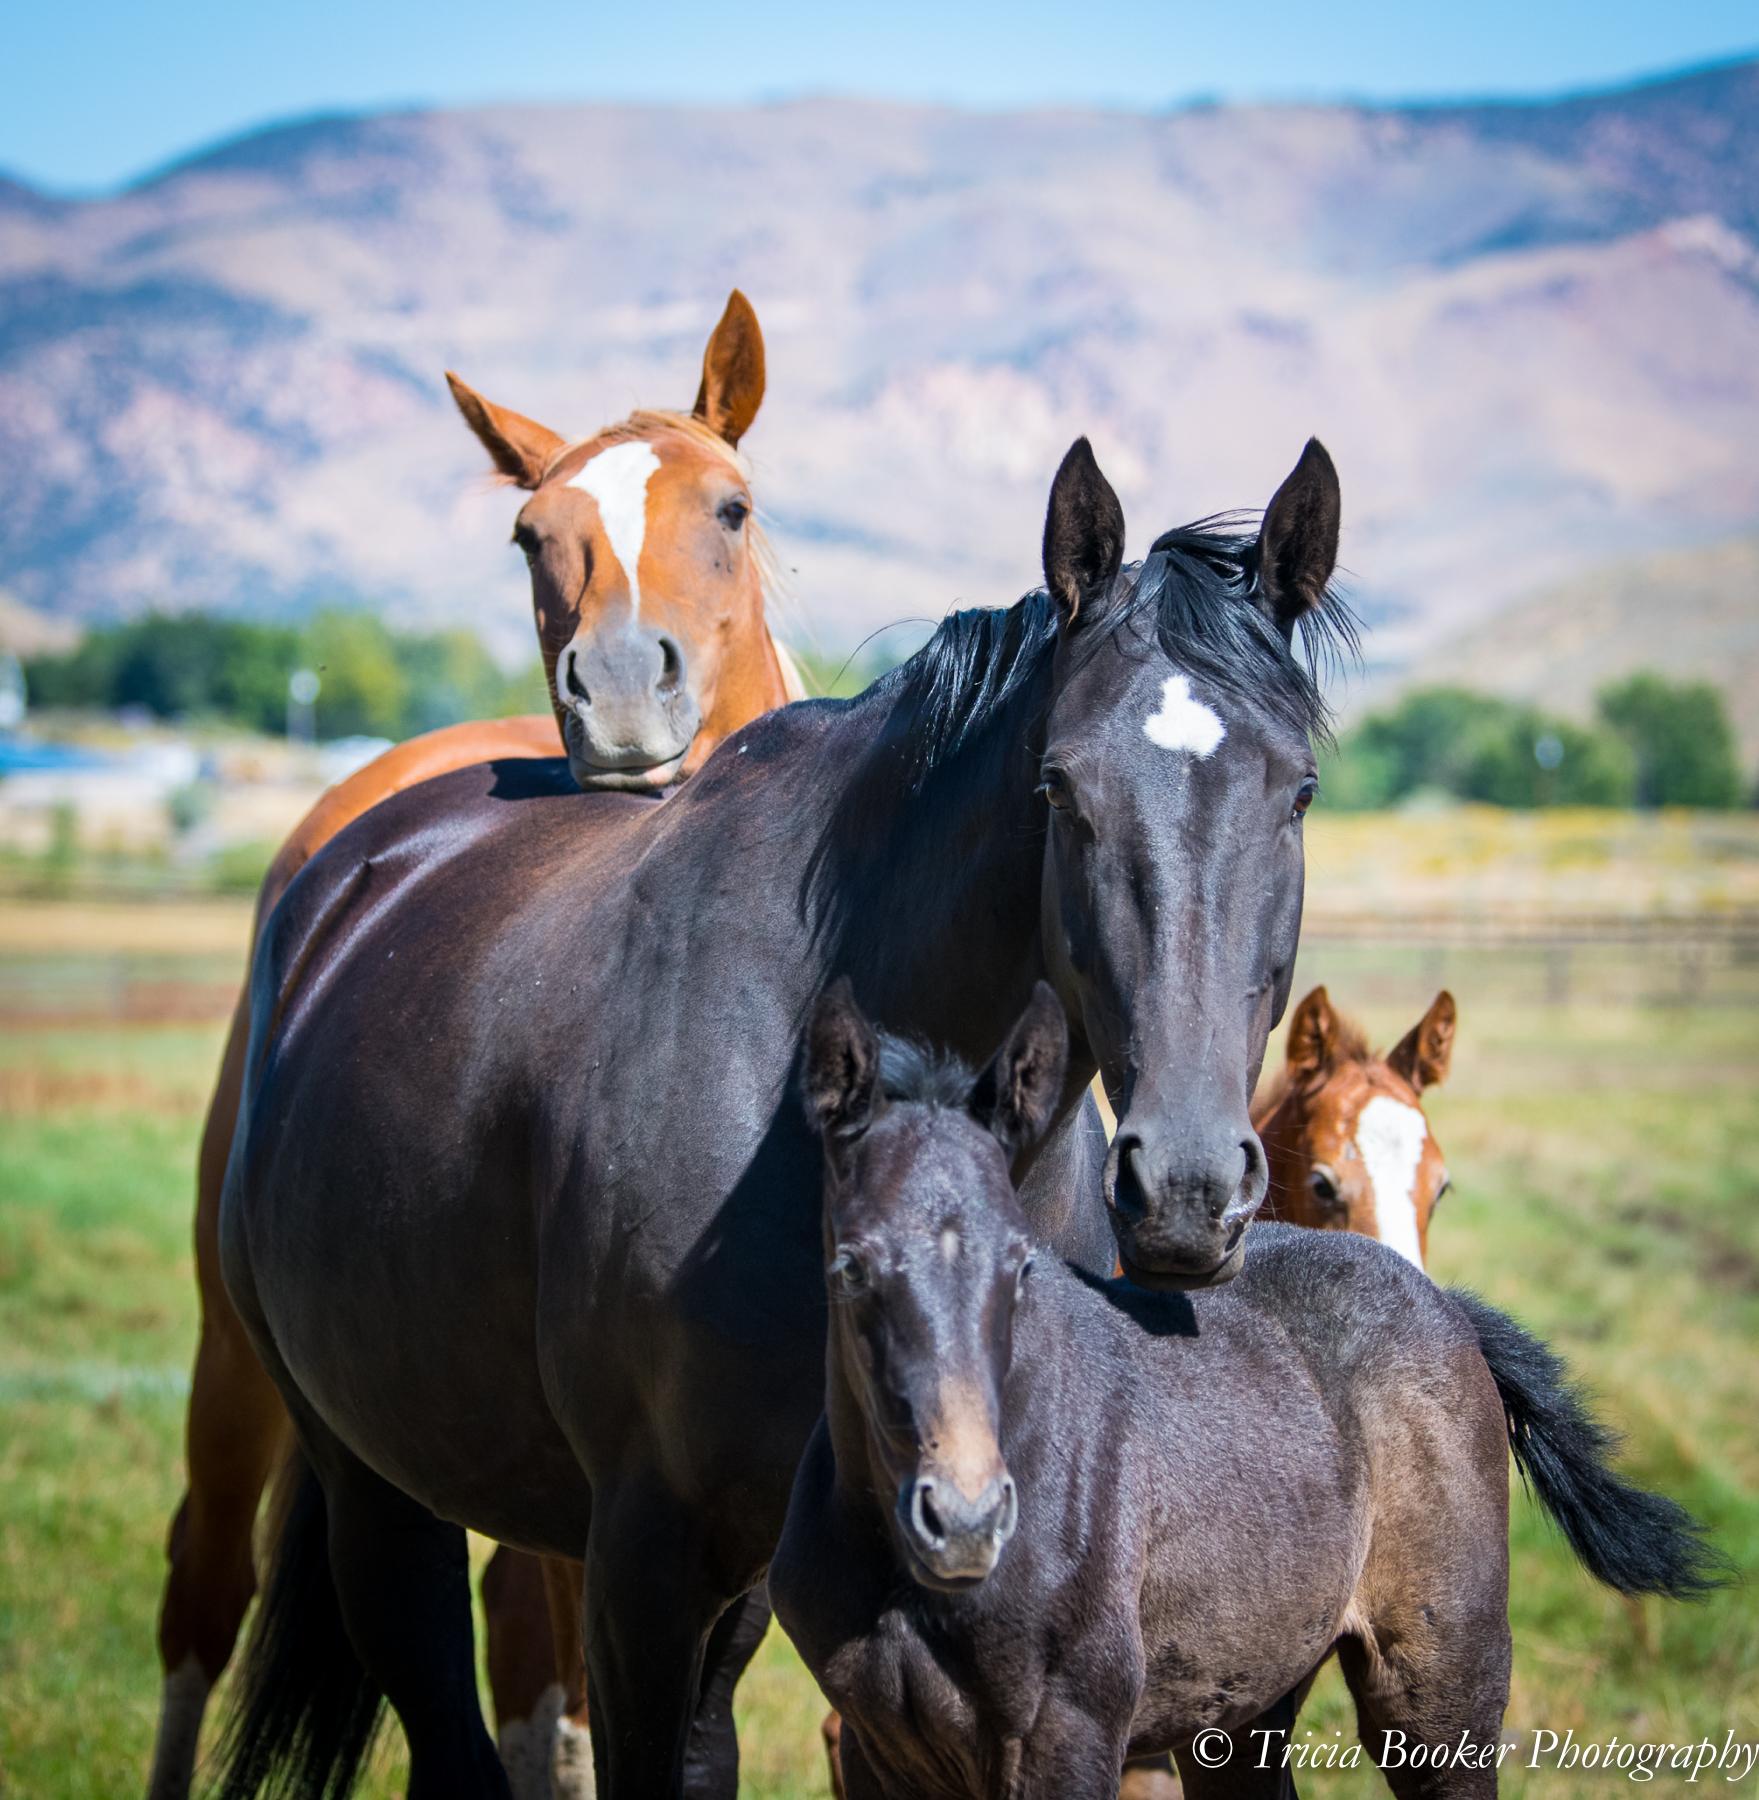 Foals-5170.jpg